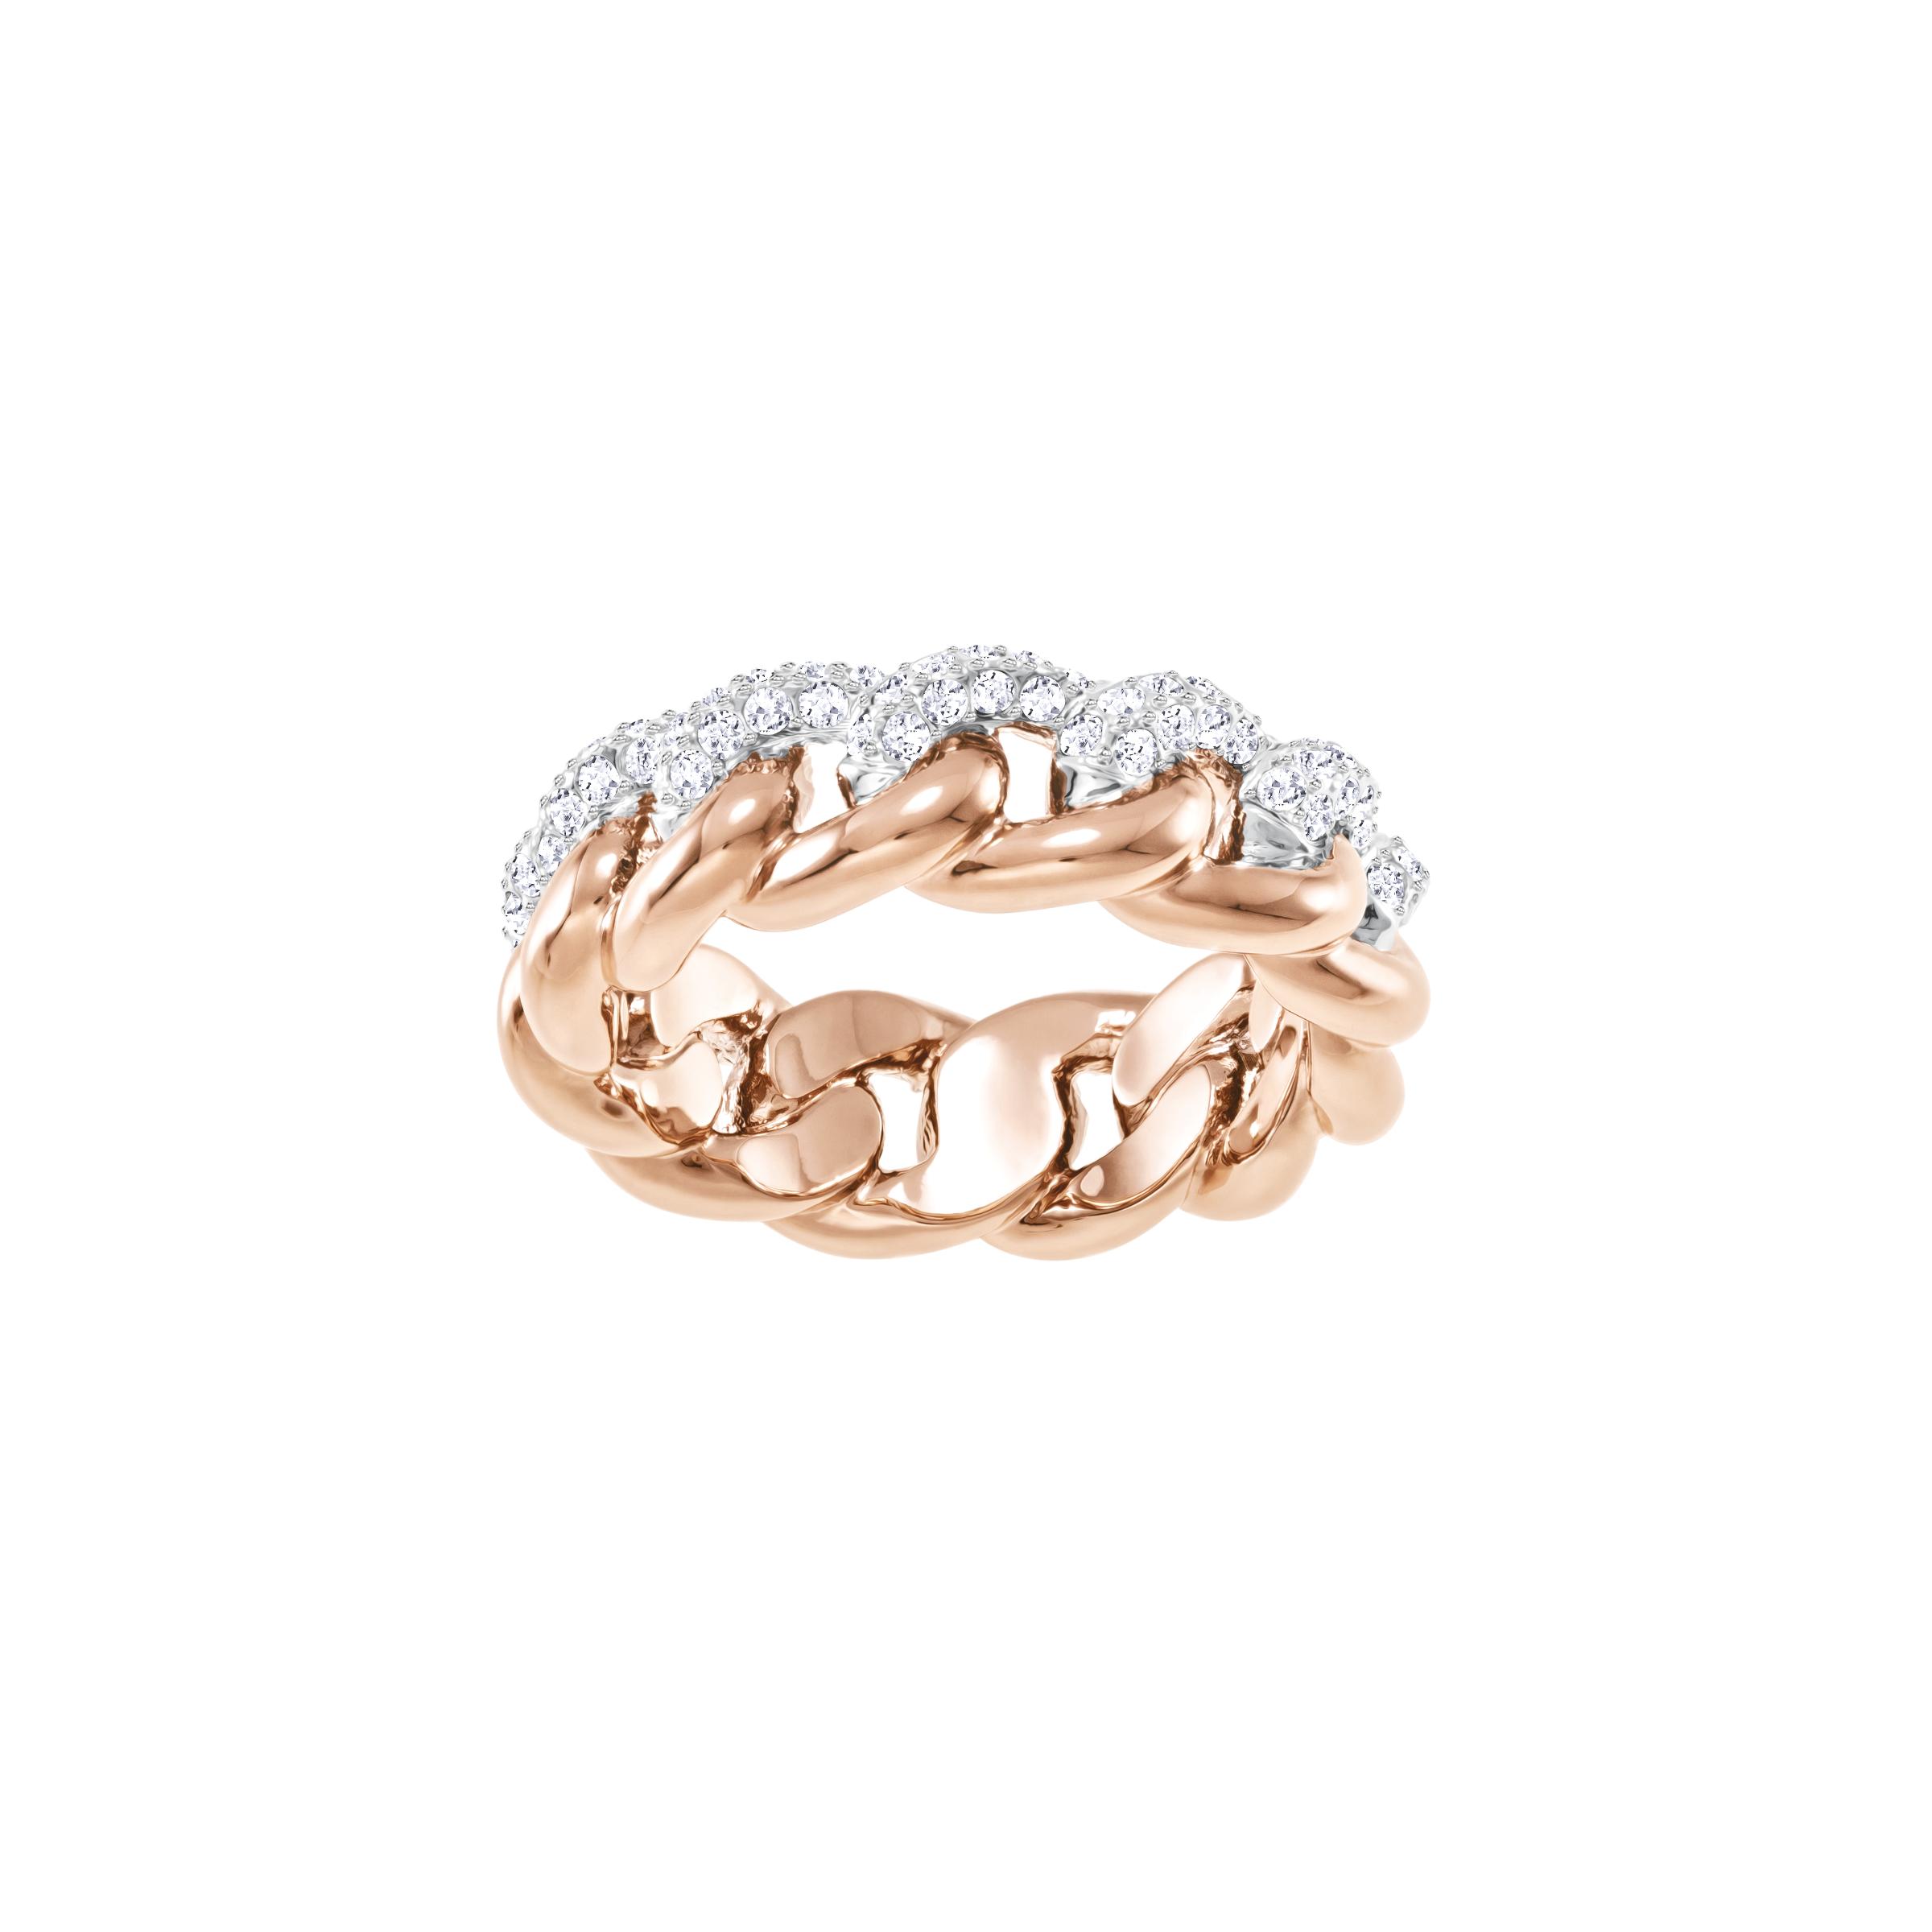 Lane Ring, White, Rose-gold tone plated